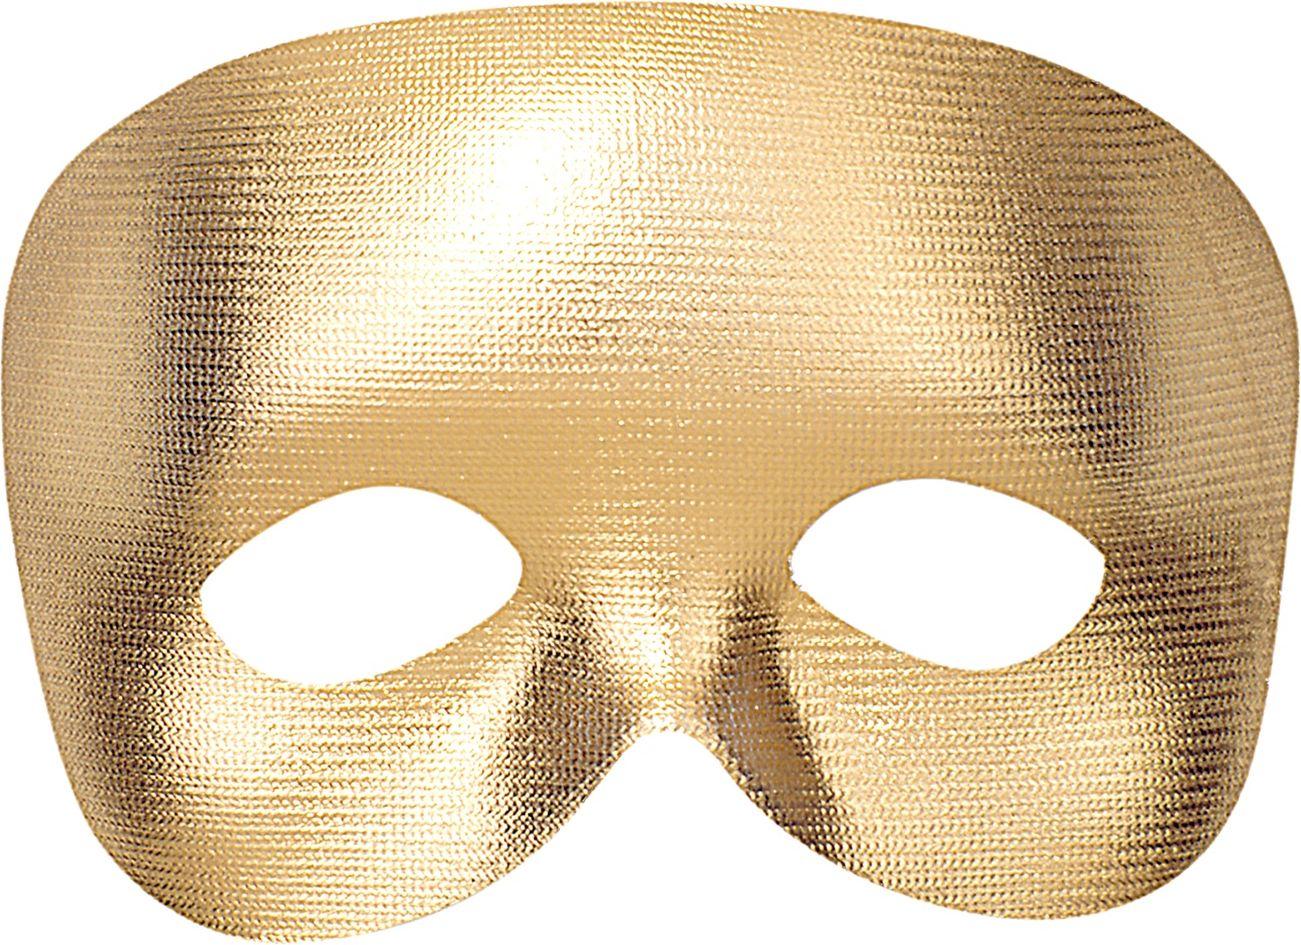 Goud fantoom oogmasker